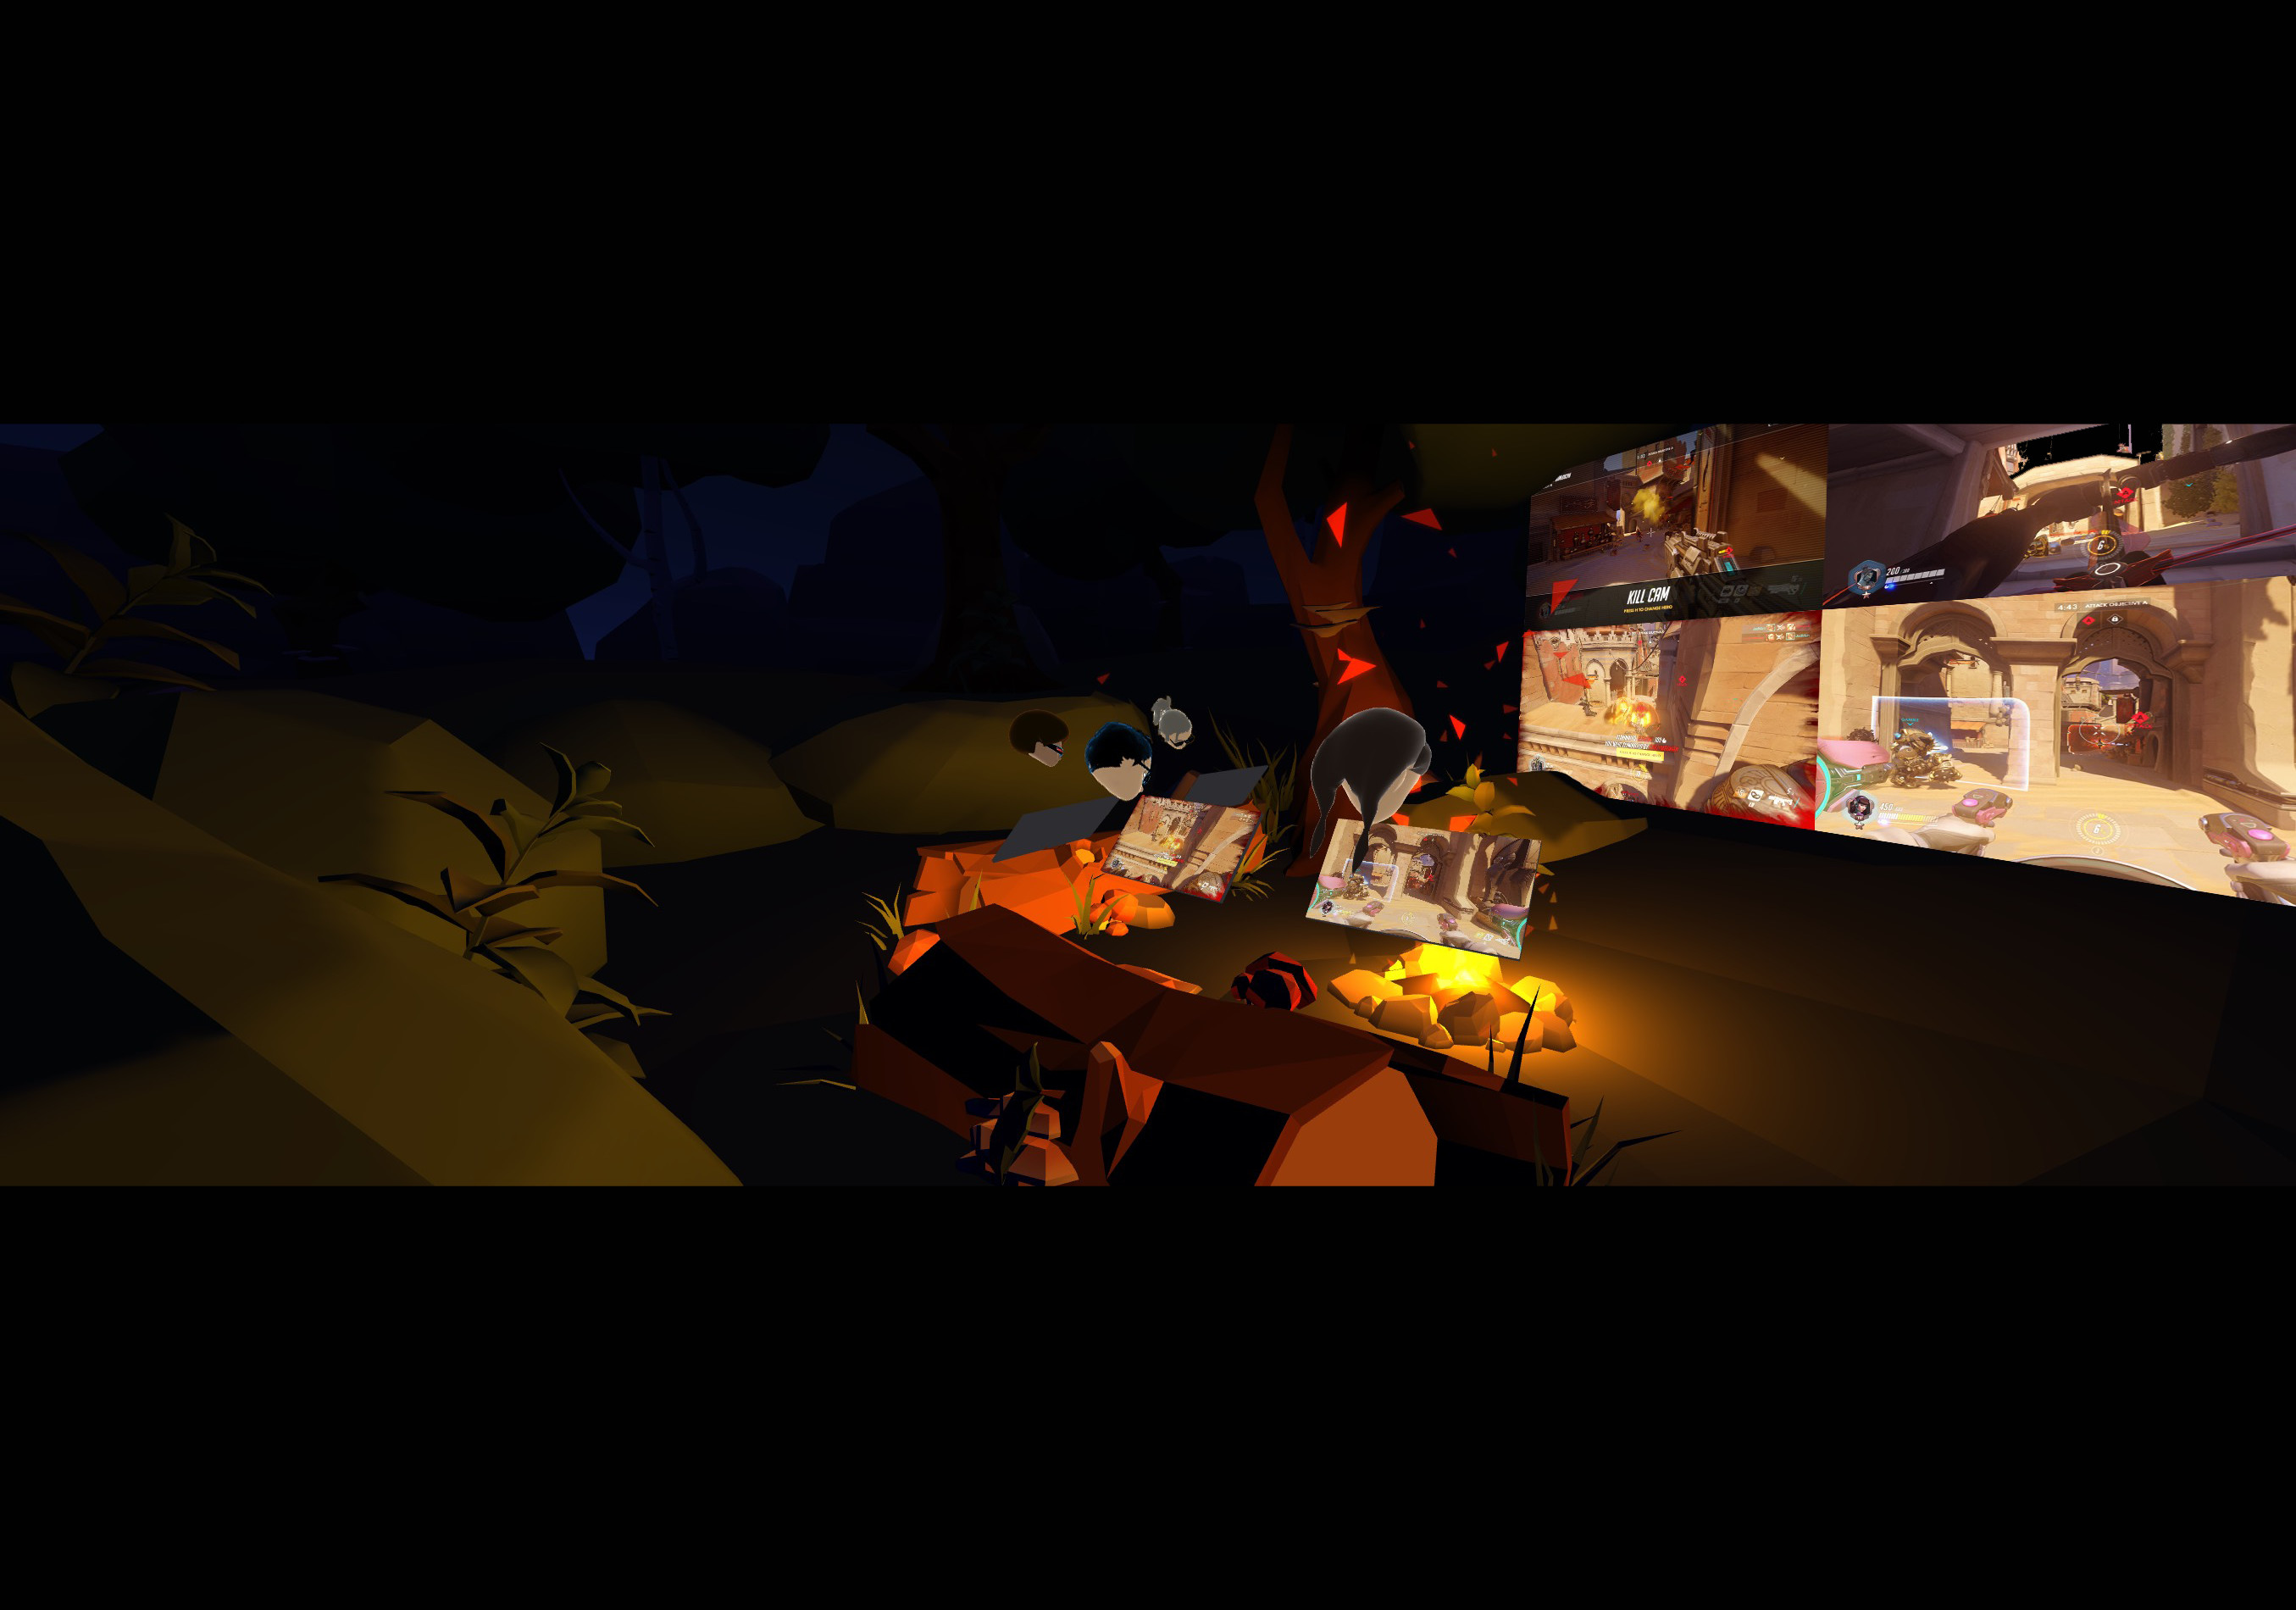 Virtual Screen Sharing VR App Bigscreen Raises $11 Million In Series A funding